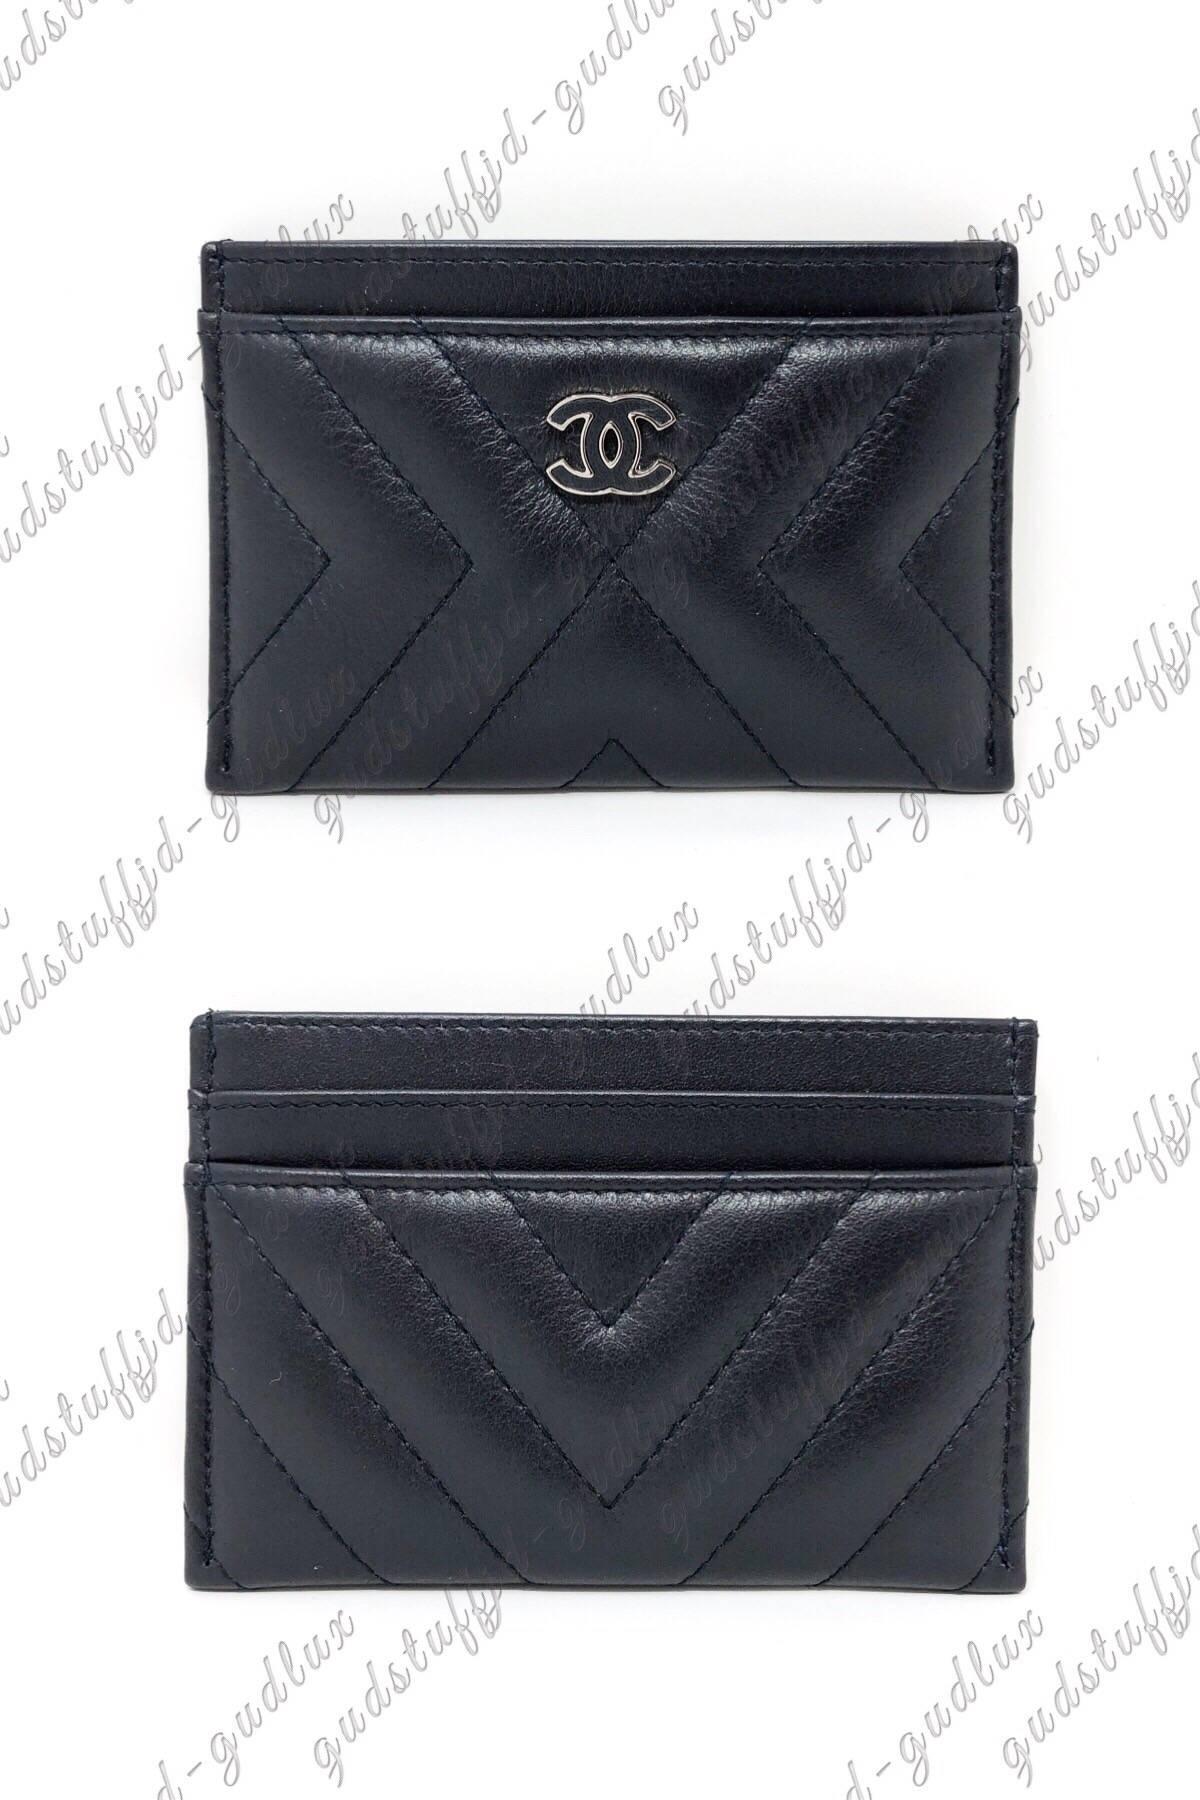 902e8d8697c0 Chanel ×. NWT Horizontal Chevron Card Case/Holder in Black Lambskin ...